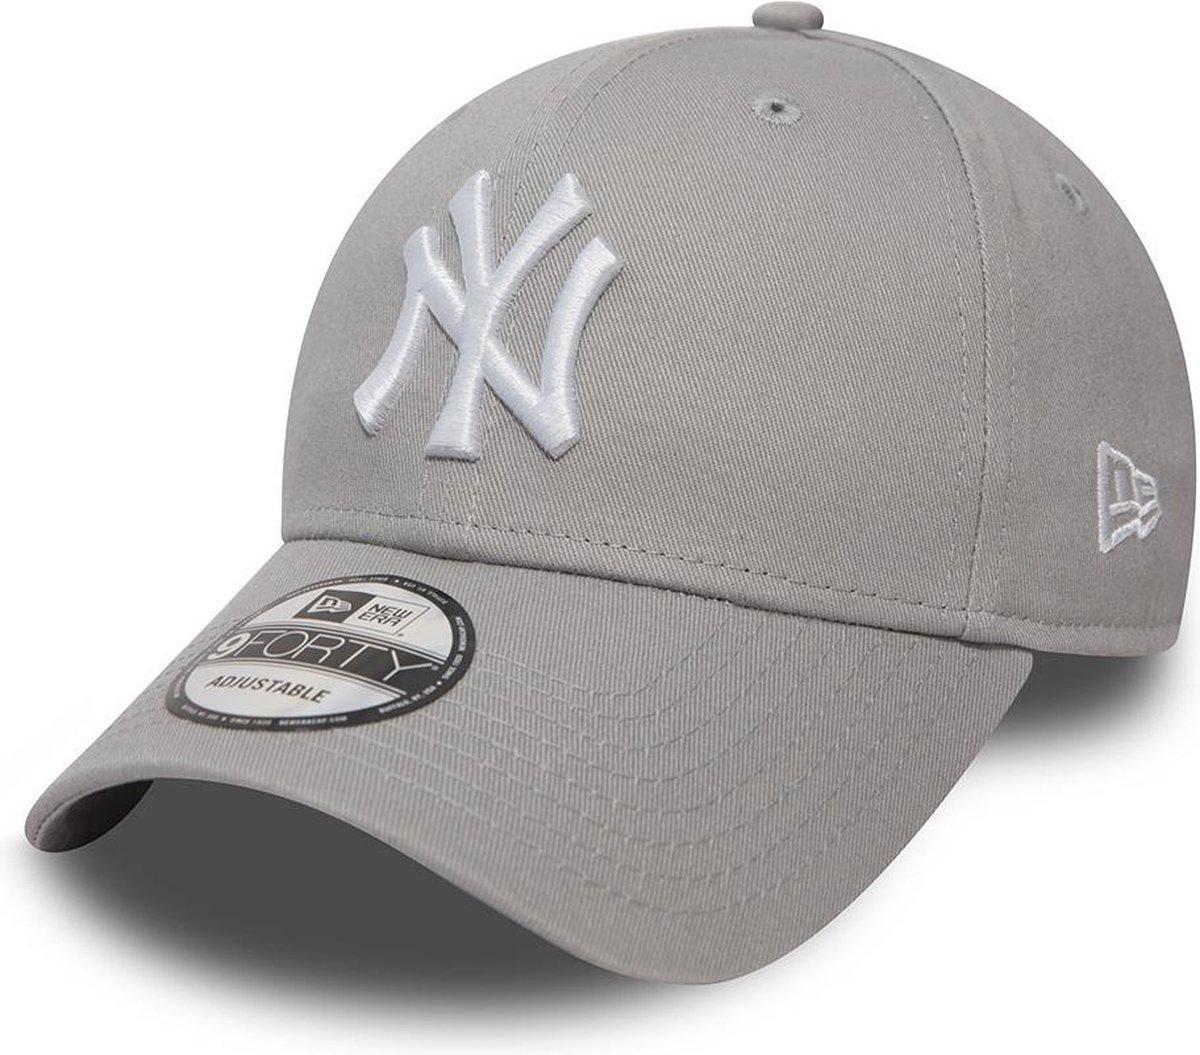 New Era 940 LEAG BASIC New York Yankees Cap - Grey - One size